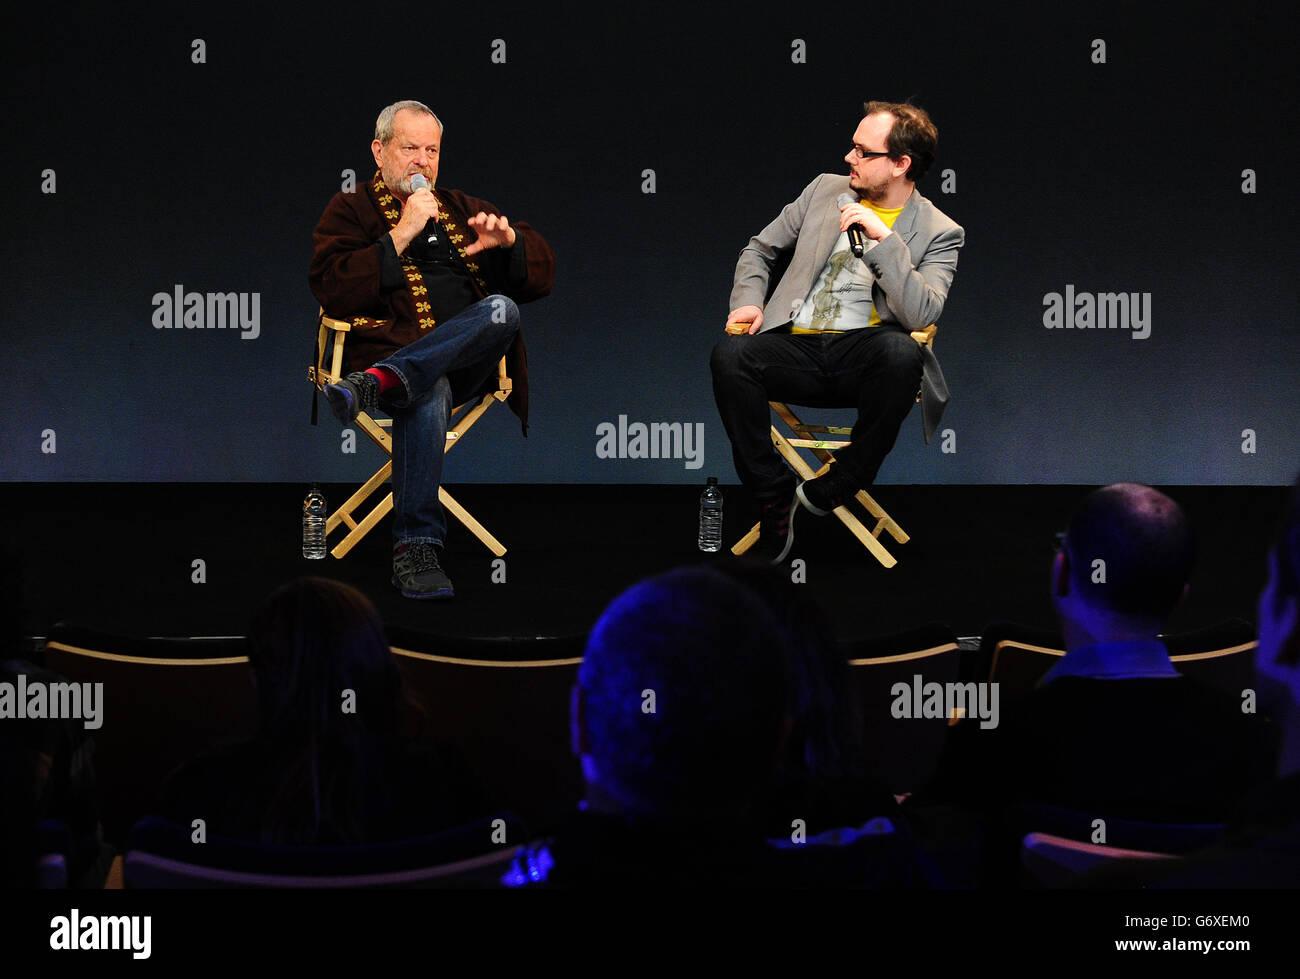 Terry Gilliam - London - Stock Image